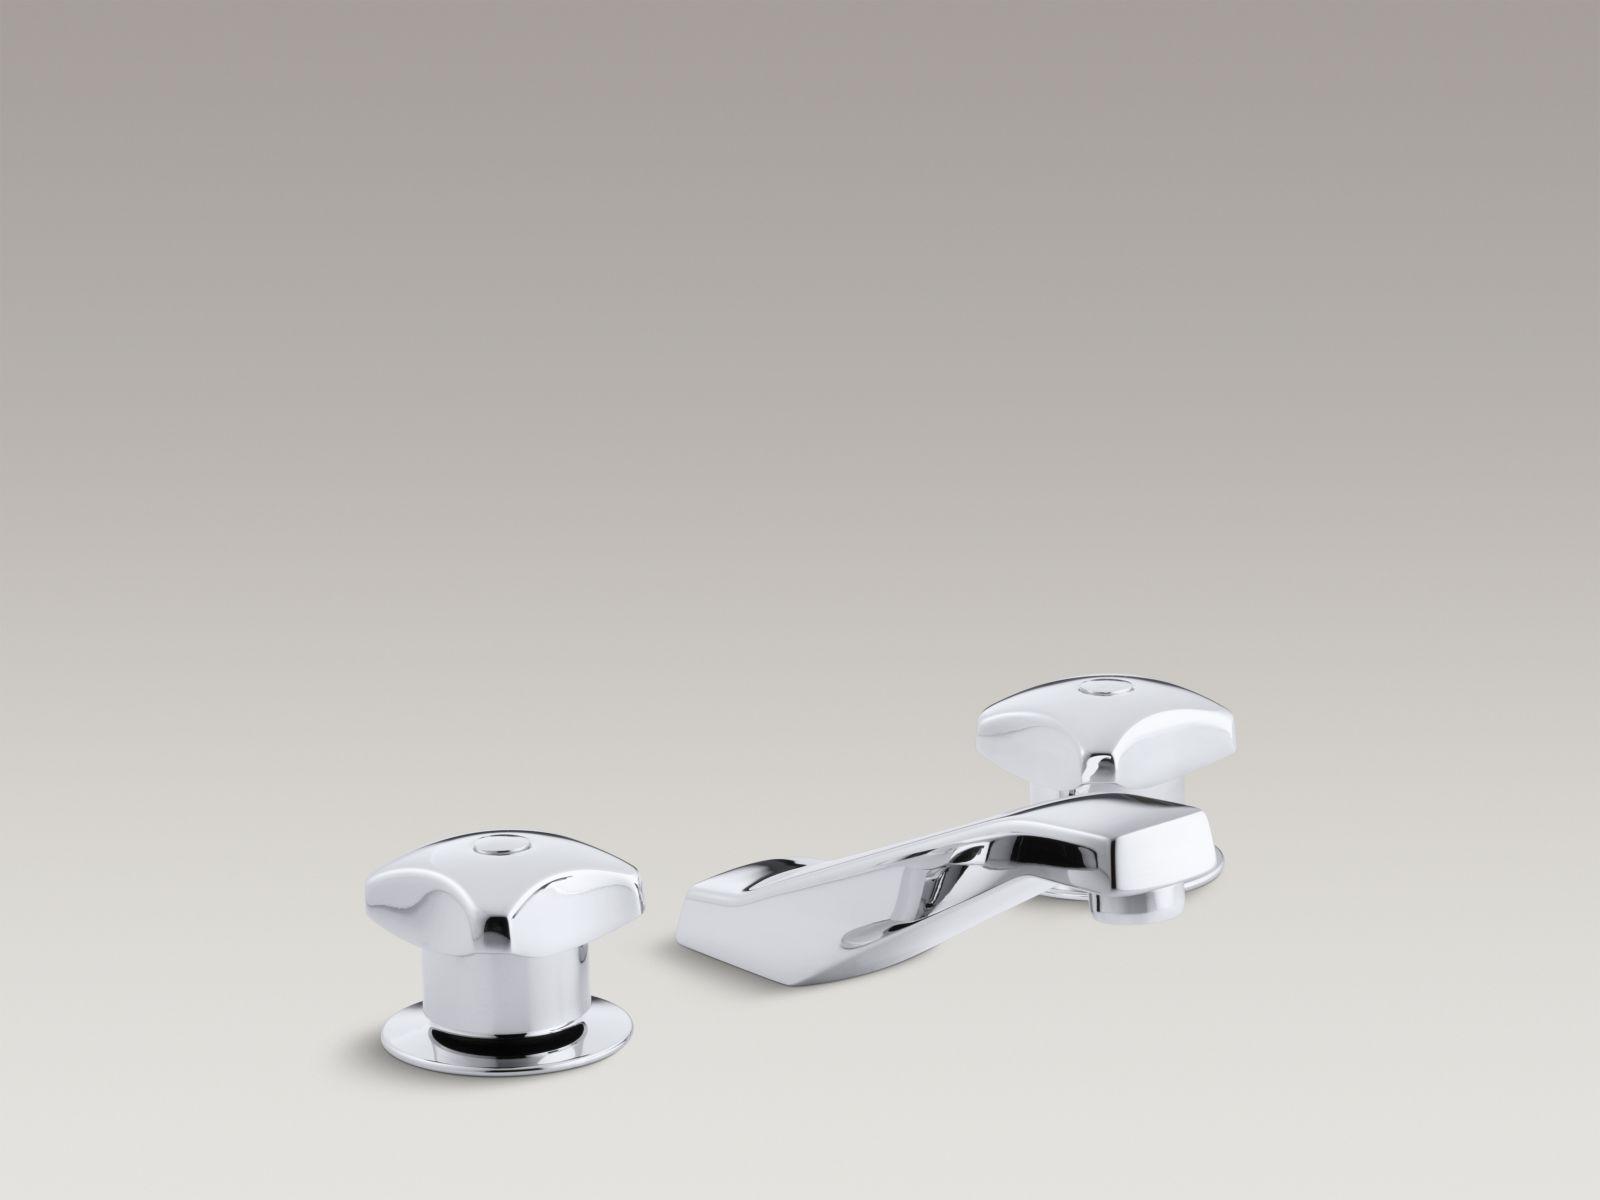 Ideas, buyplumbing category wide set bathroom faucet regarding dimensions 1600 x 1200  .